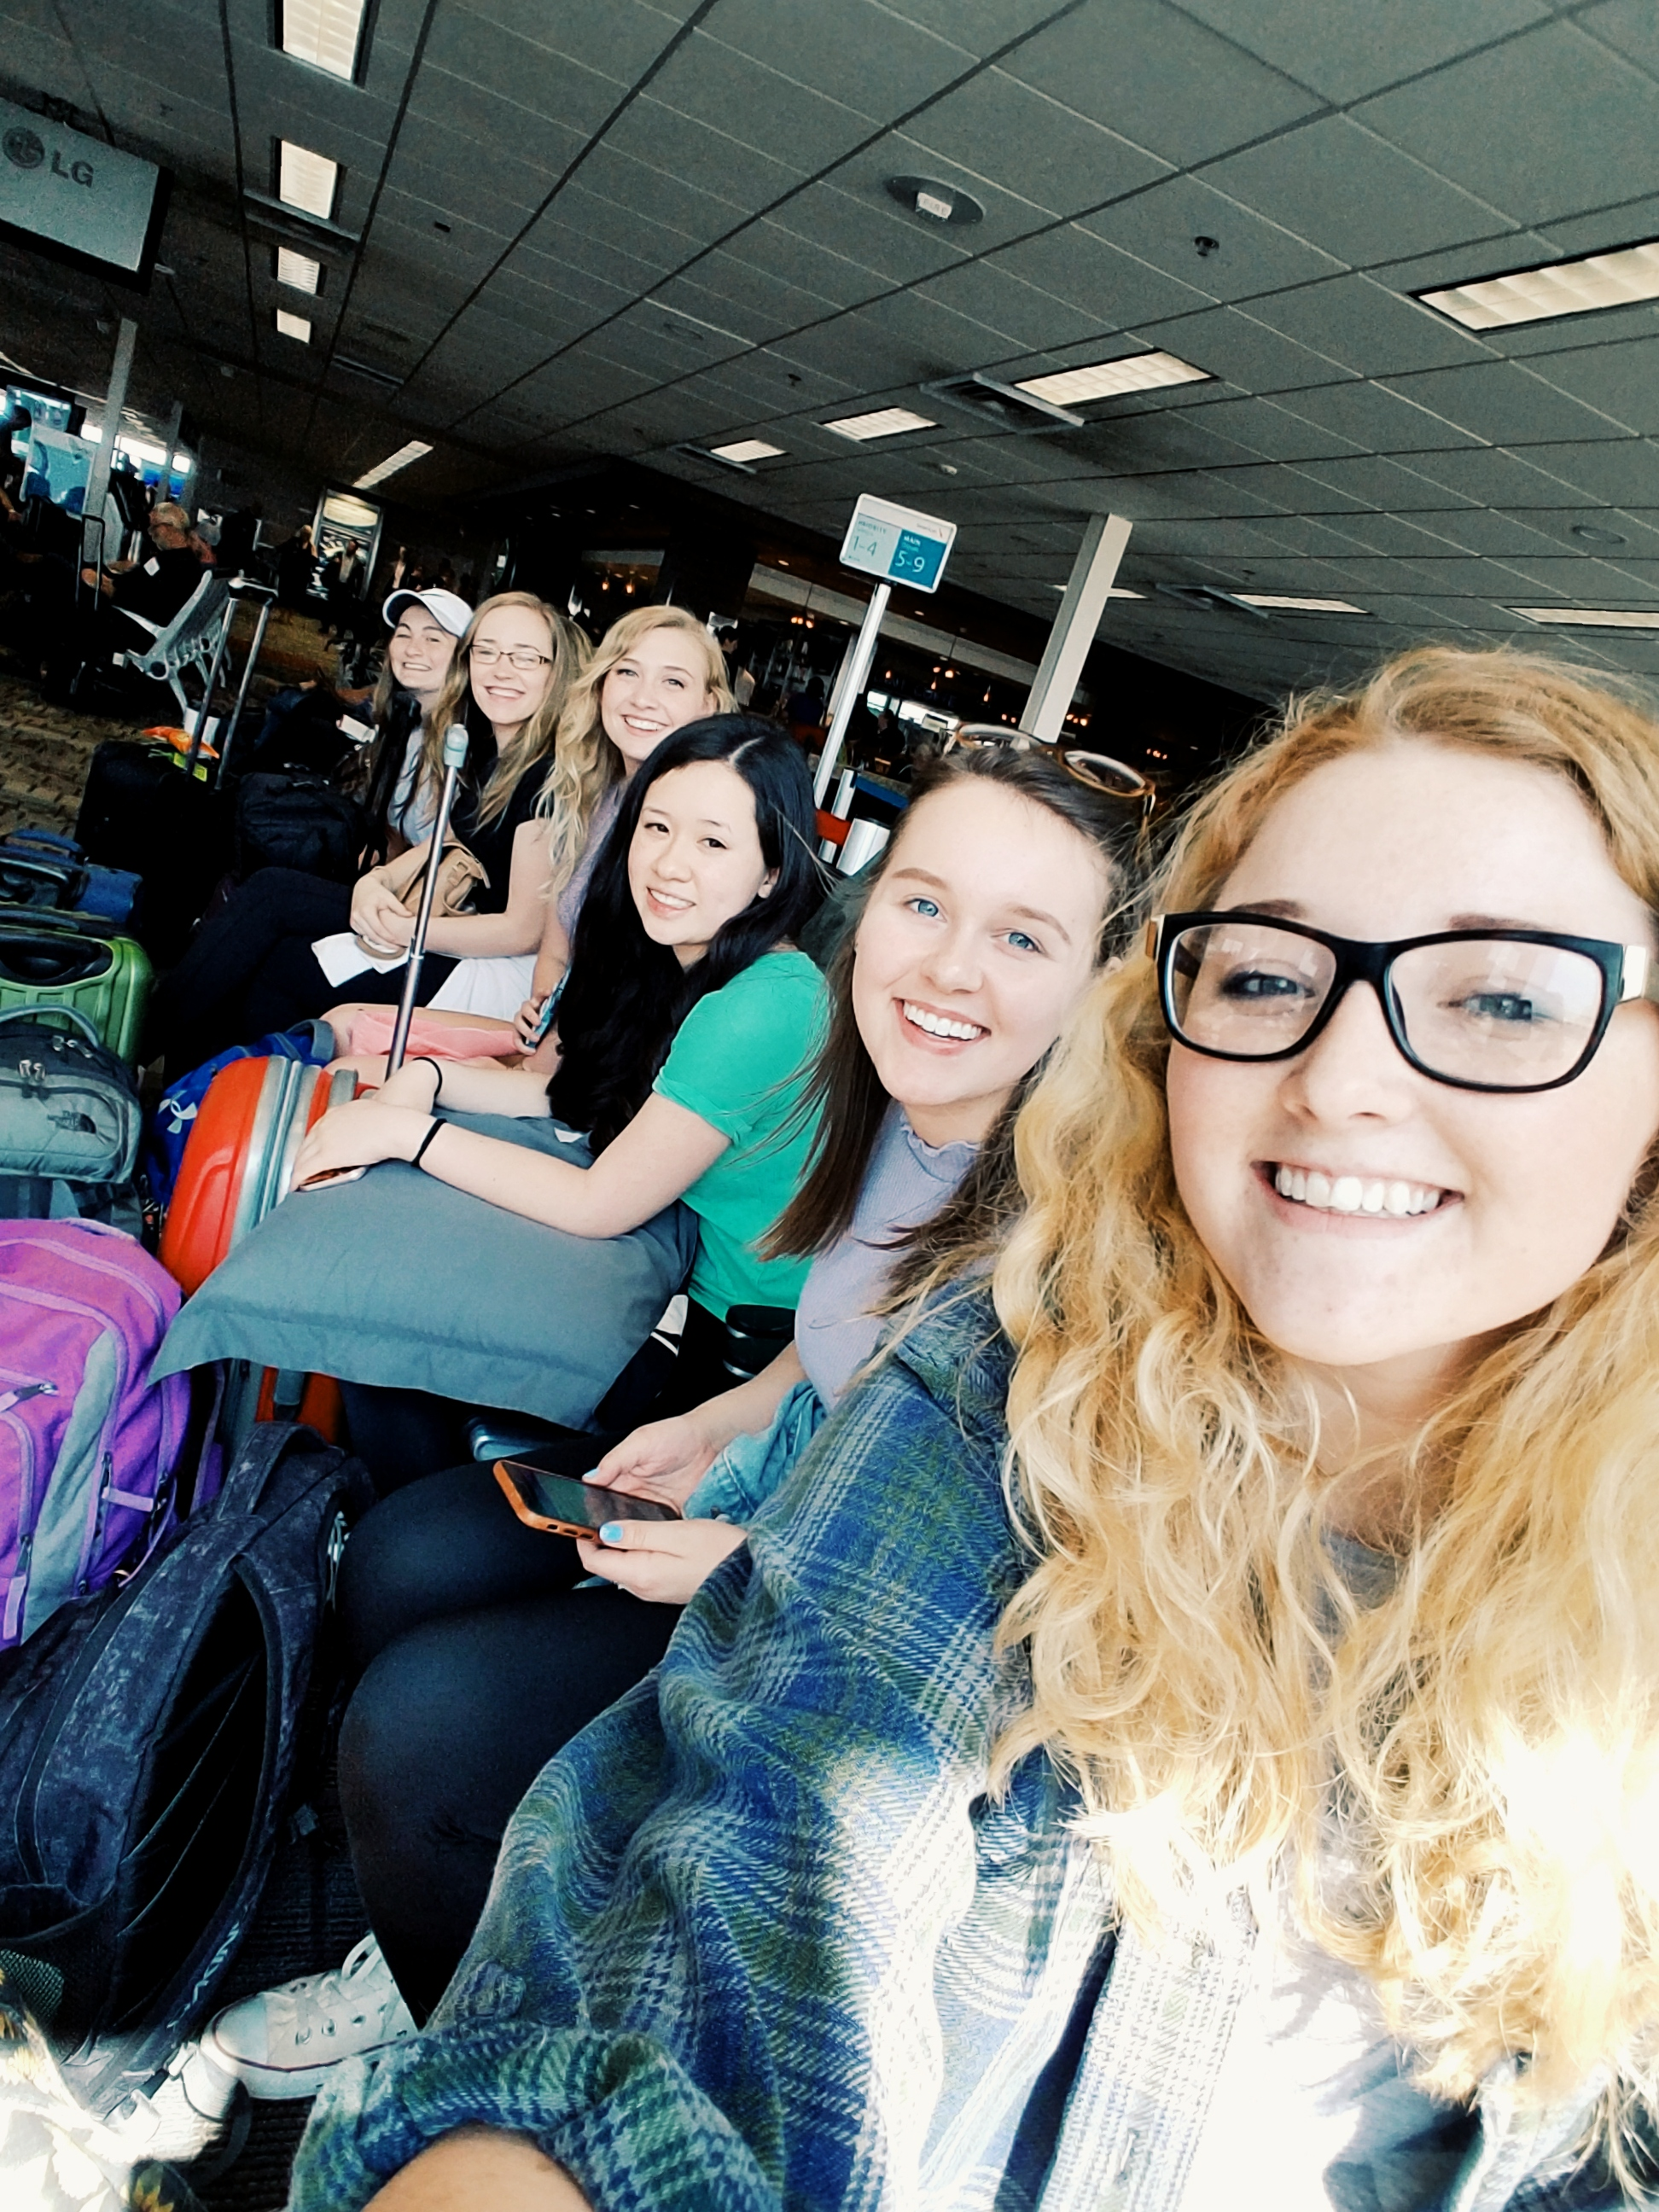 MSP International Airport: T-Minus One Hour 'til Takeoff